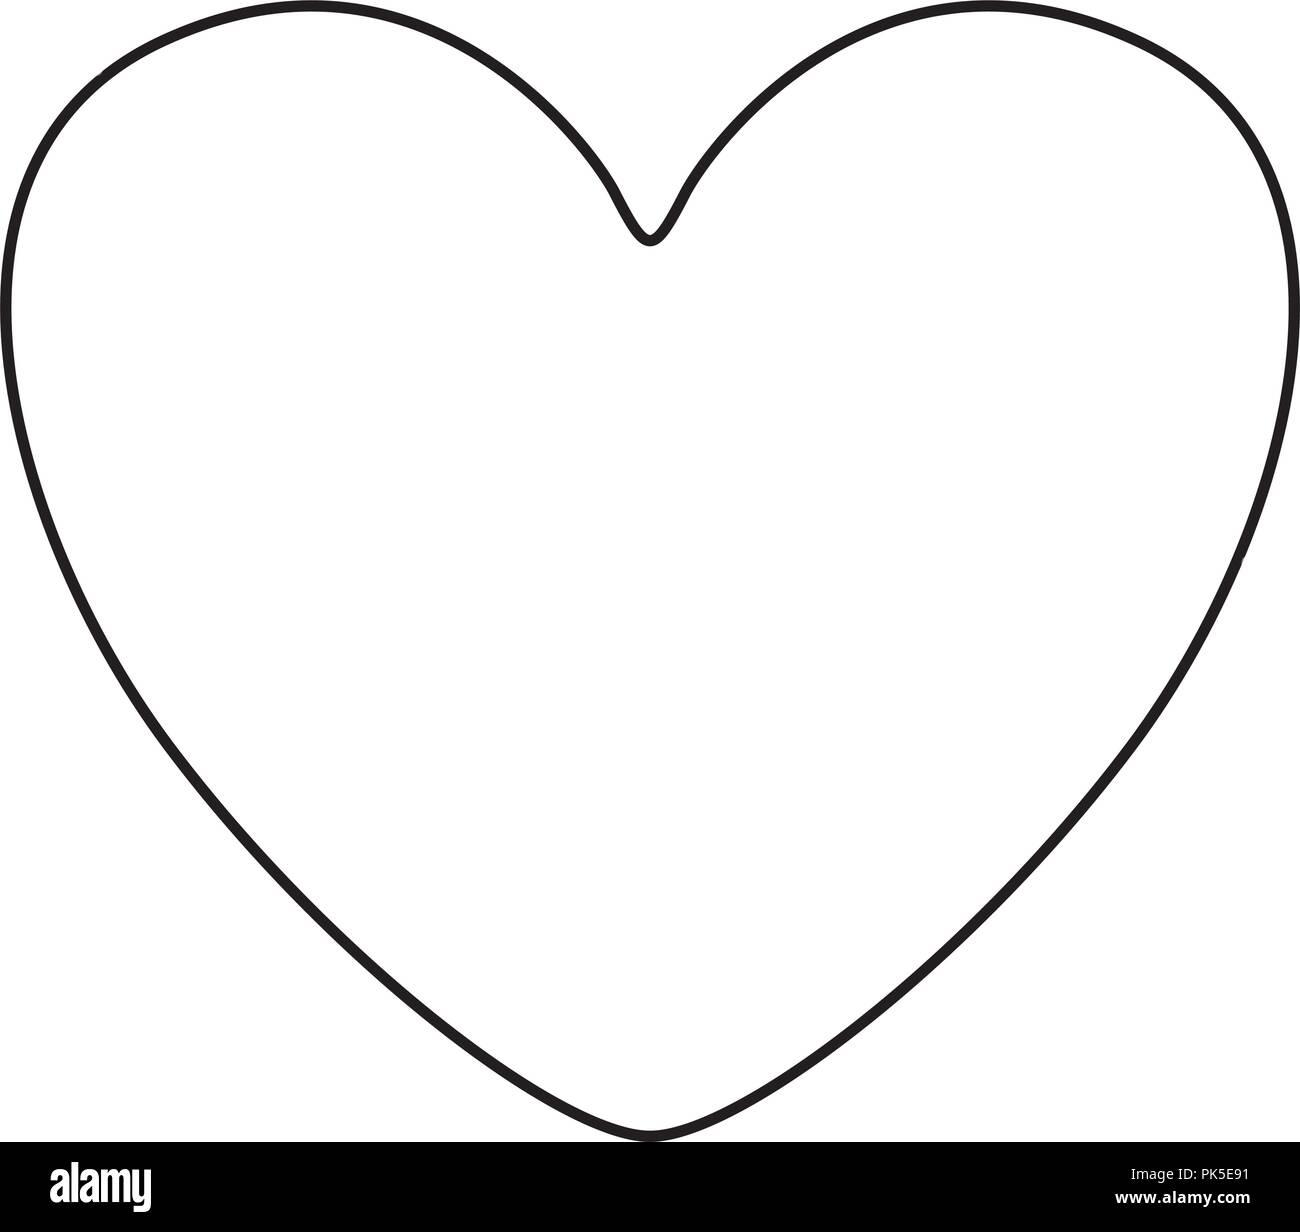 Isolated heart shape design - Stock Image